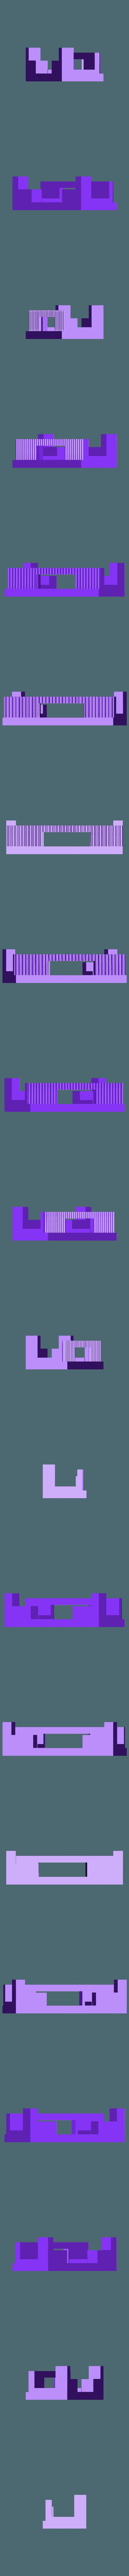 PCB_2_v57_PCB_2_v57_Component19_2_Body35_Component19.stl Télécharger fichier STL gratuit Cyclone PCB Factory Dual Z-axis • Objet pour impression 3D, TinkersProjects